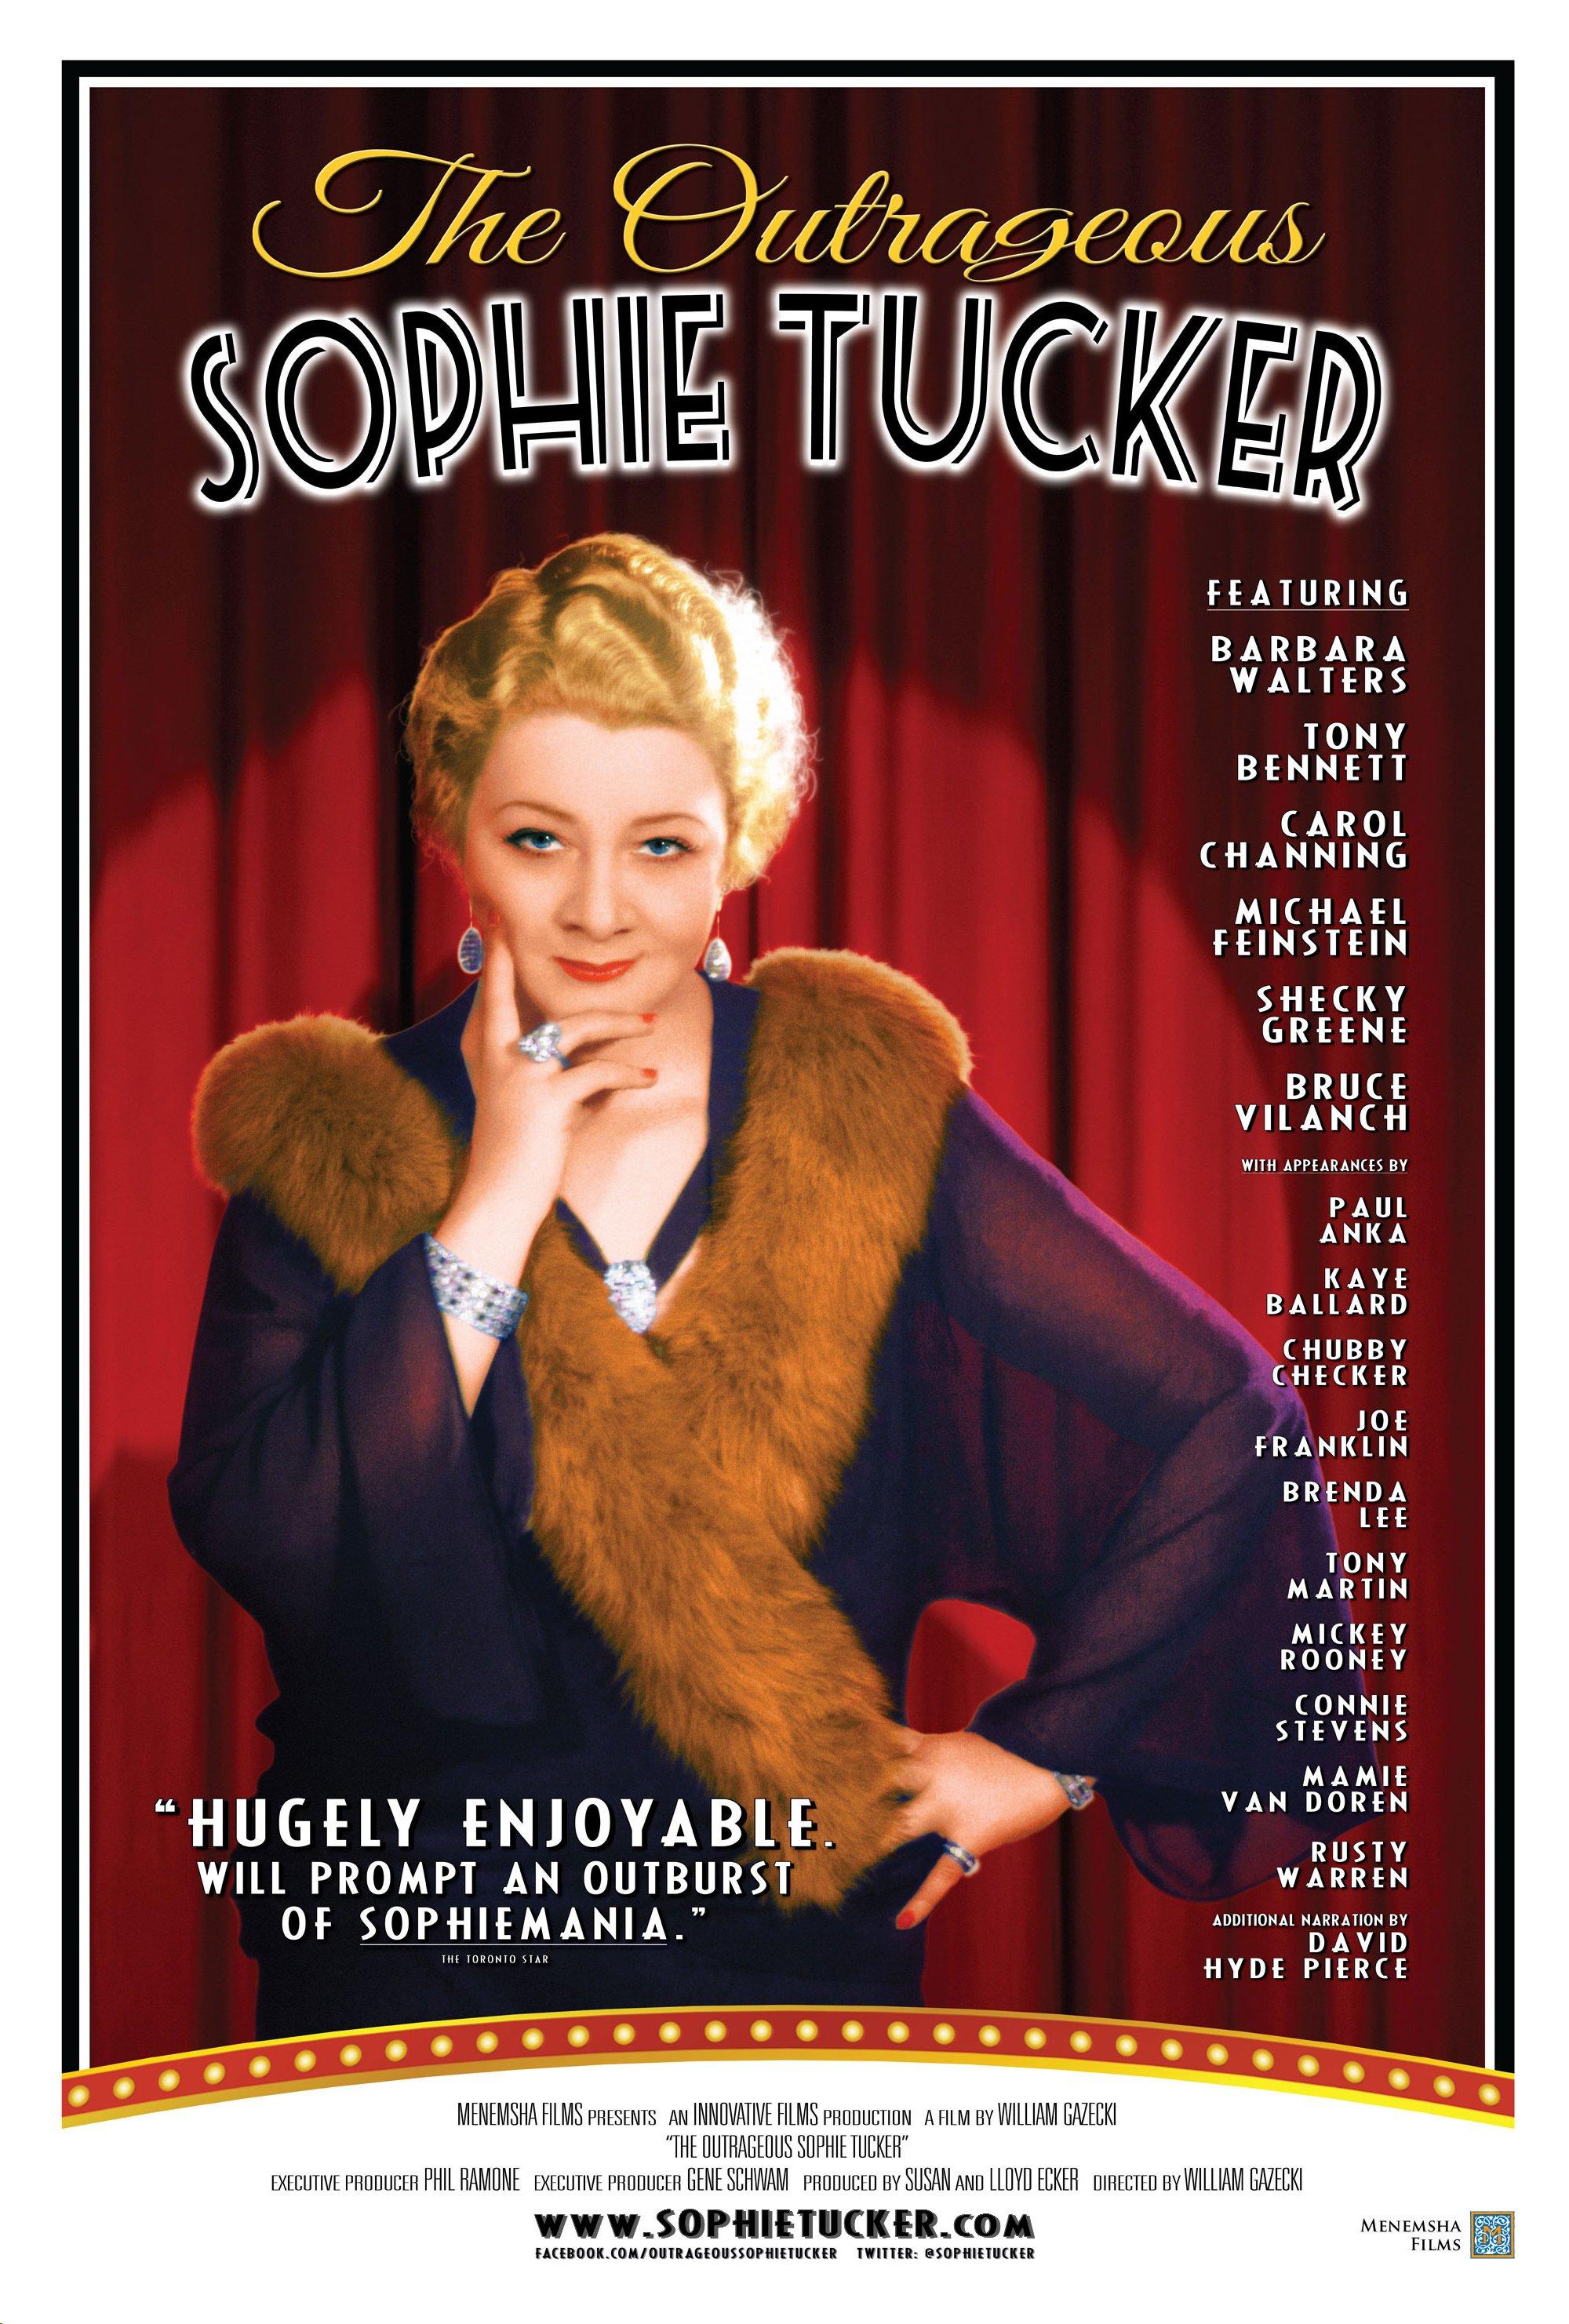 Dr. Sue Sophie Tucker